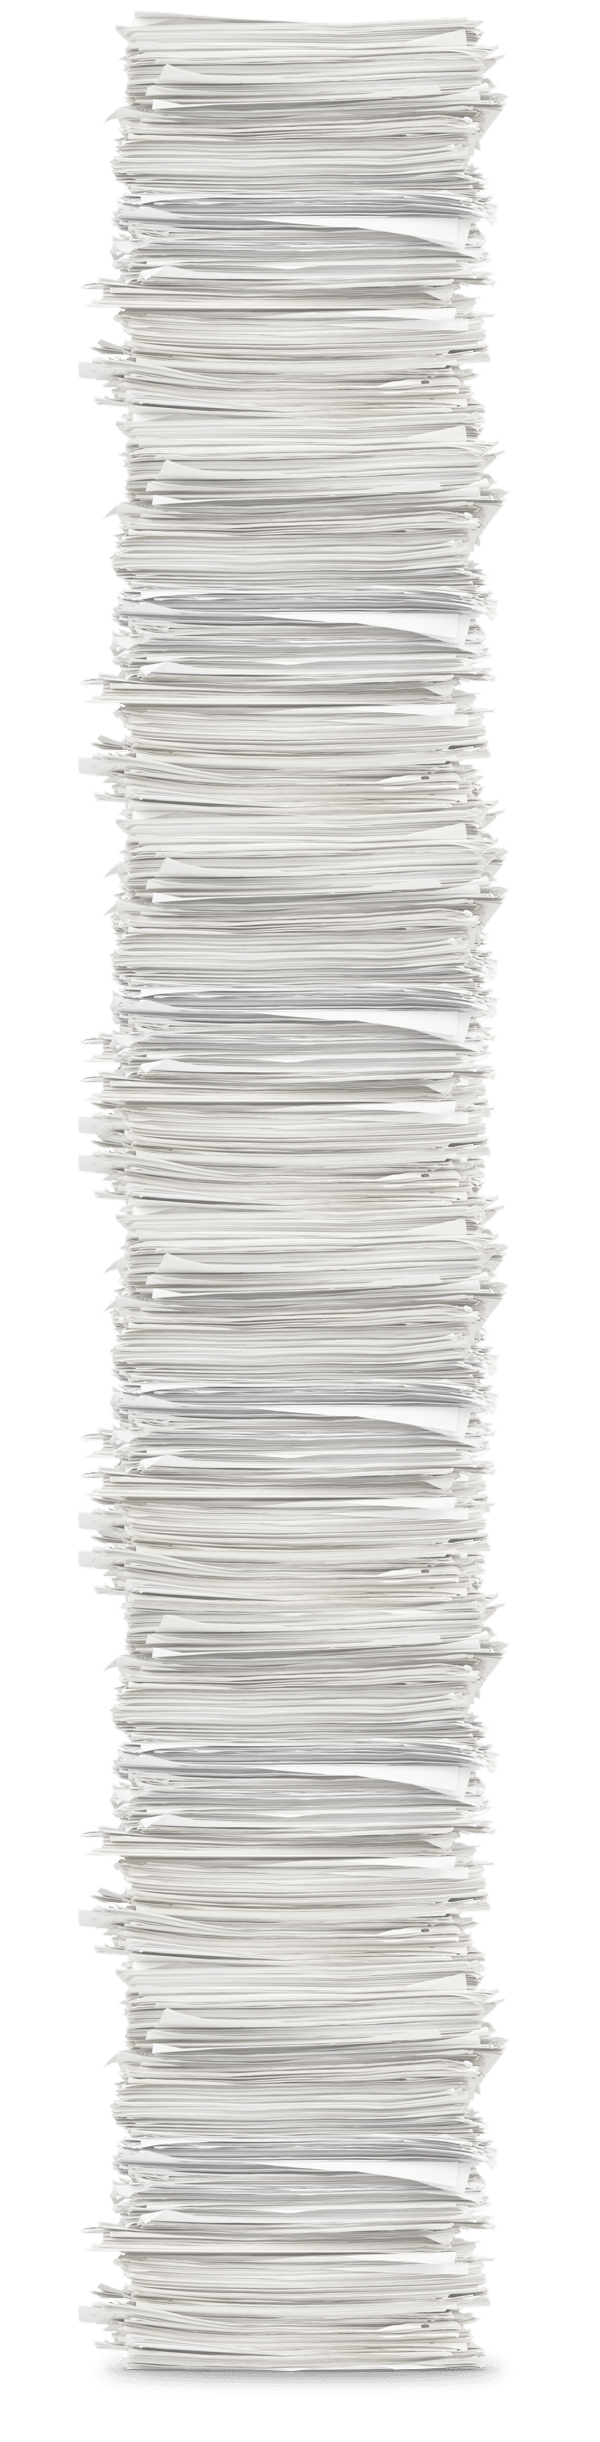 2017 Resume Templates